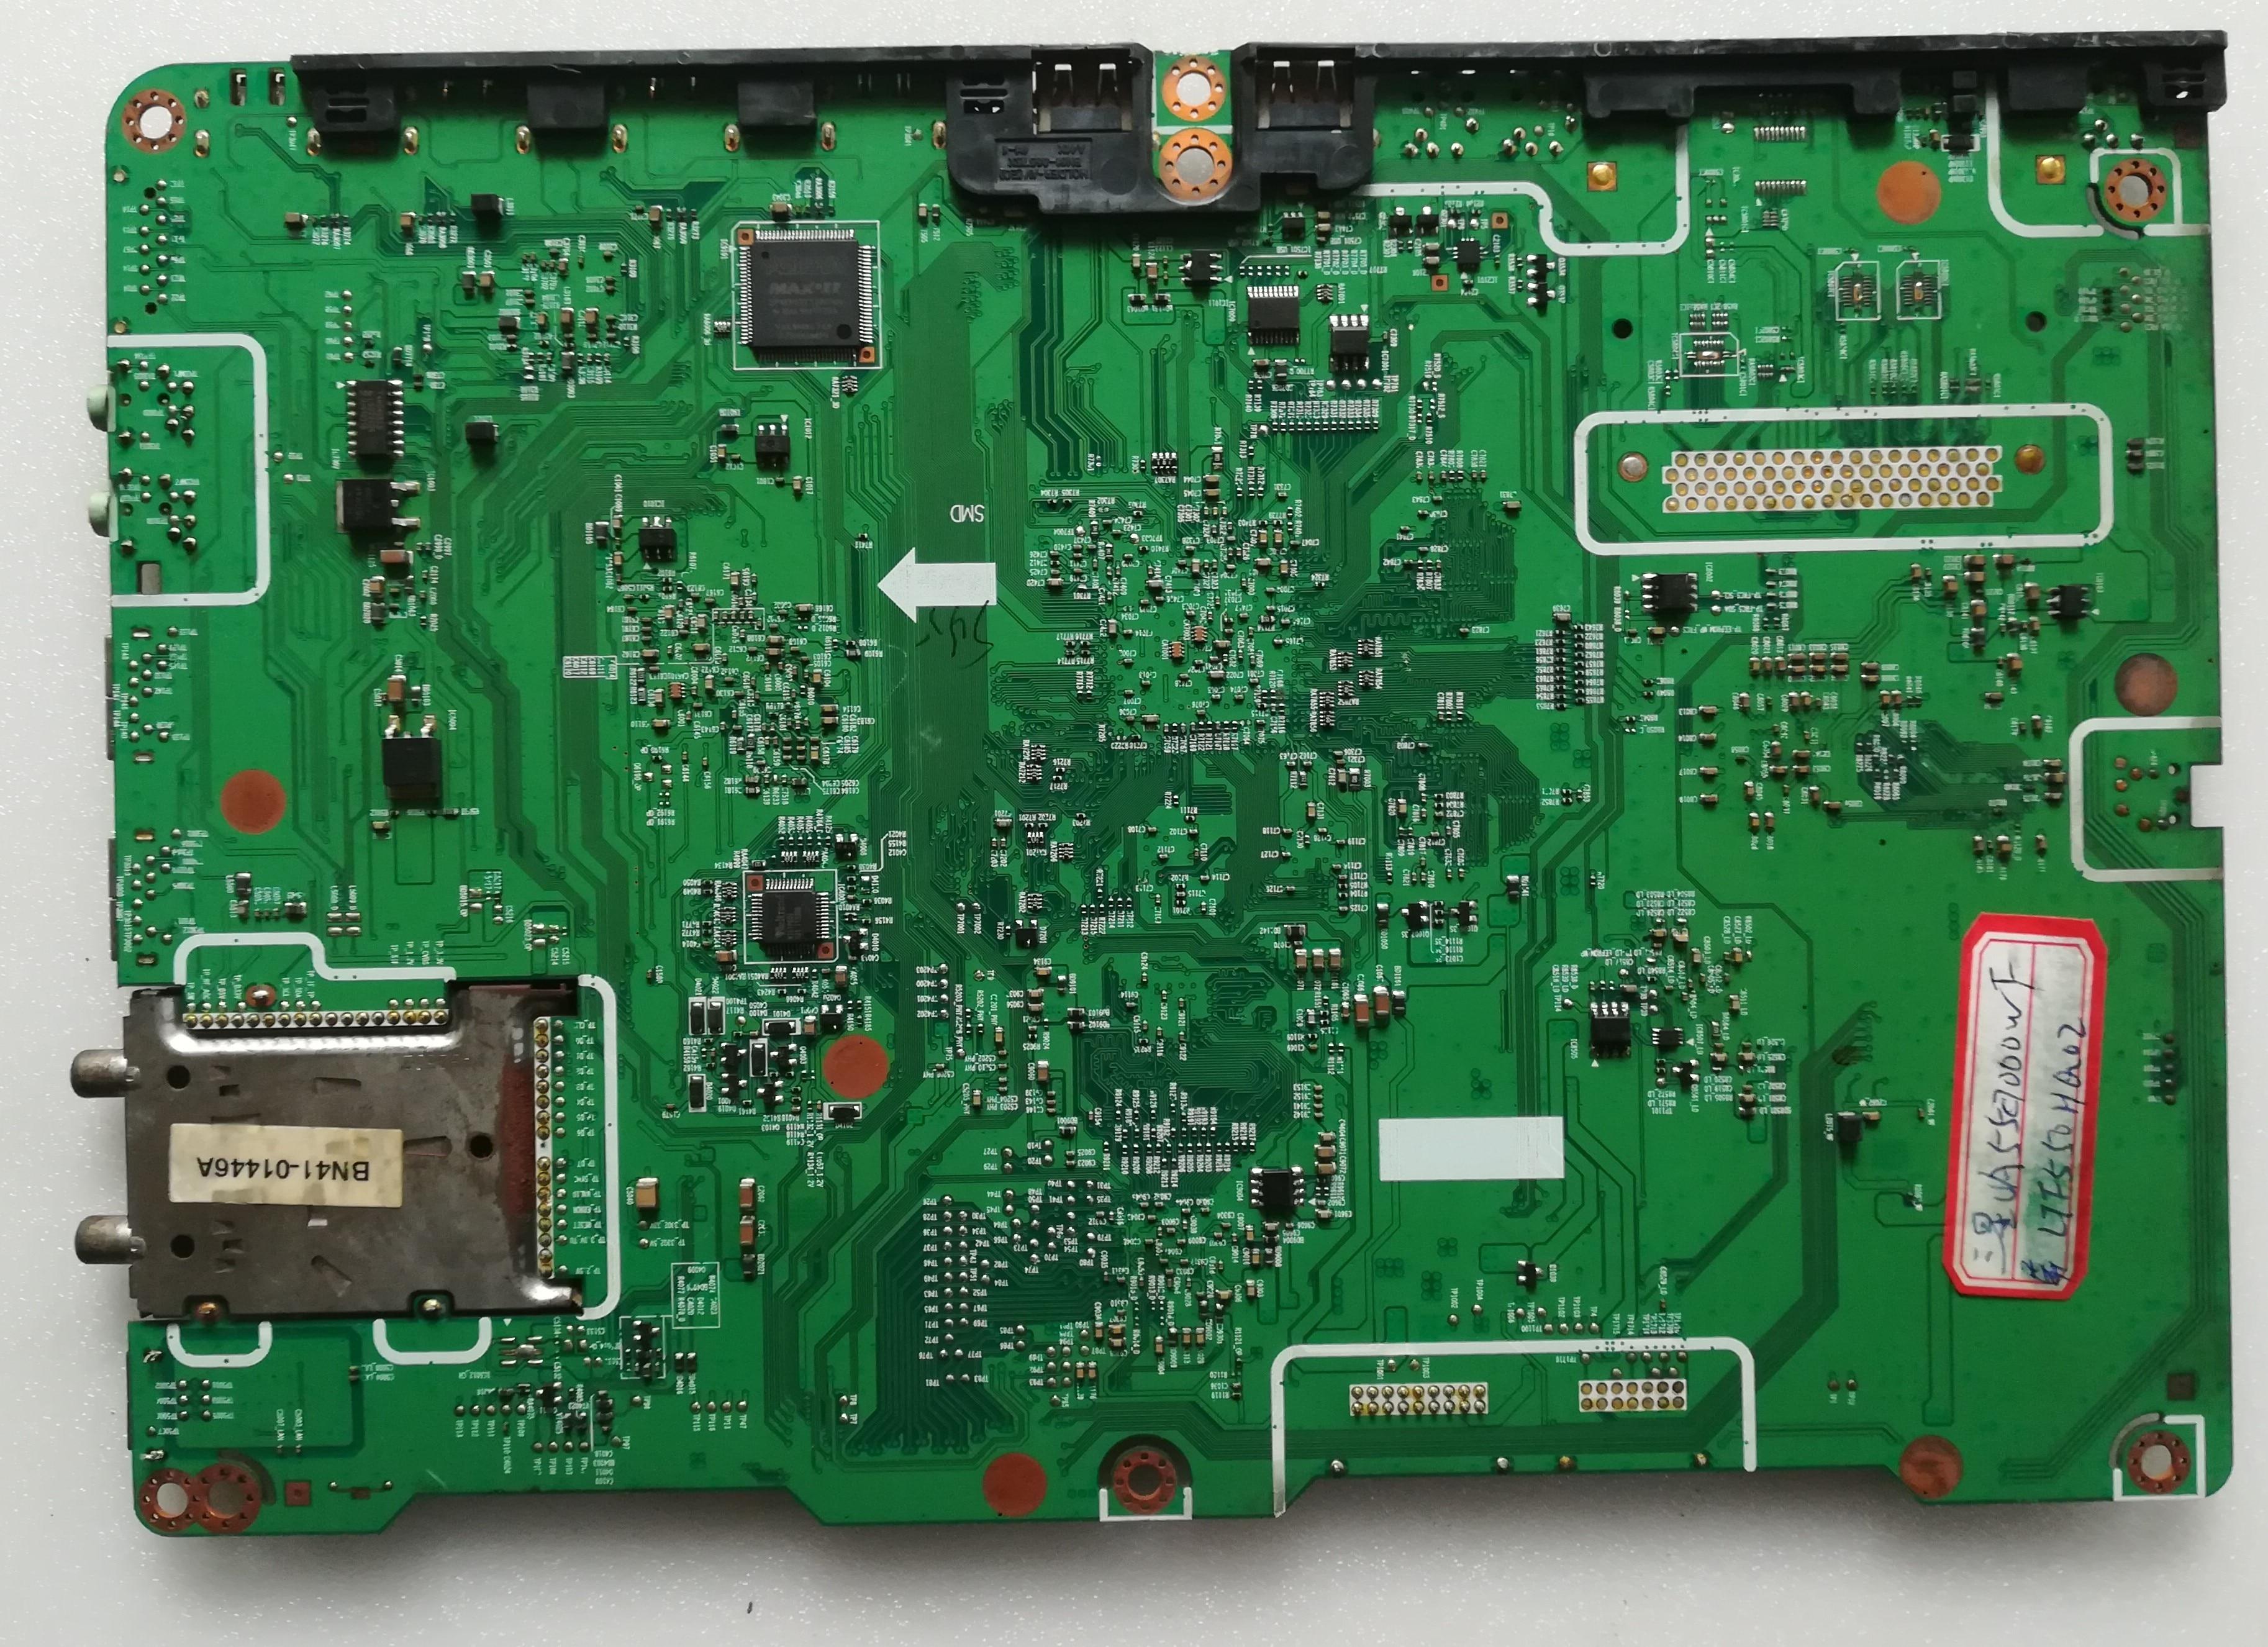 Original Logic Circuit Board Main Board Ua55c7000wf Ua46c7000wf TV Main Board Bn41-01446b With Ltf550hq02 Circuit Board